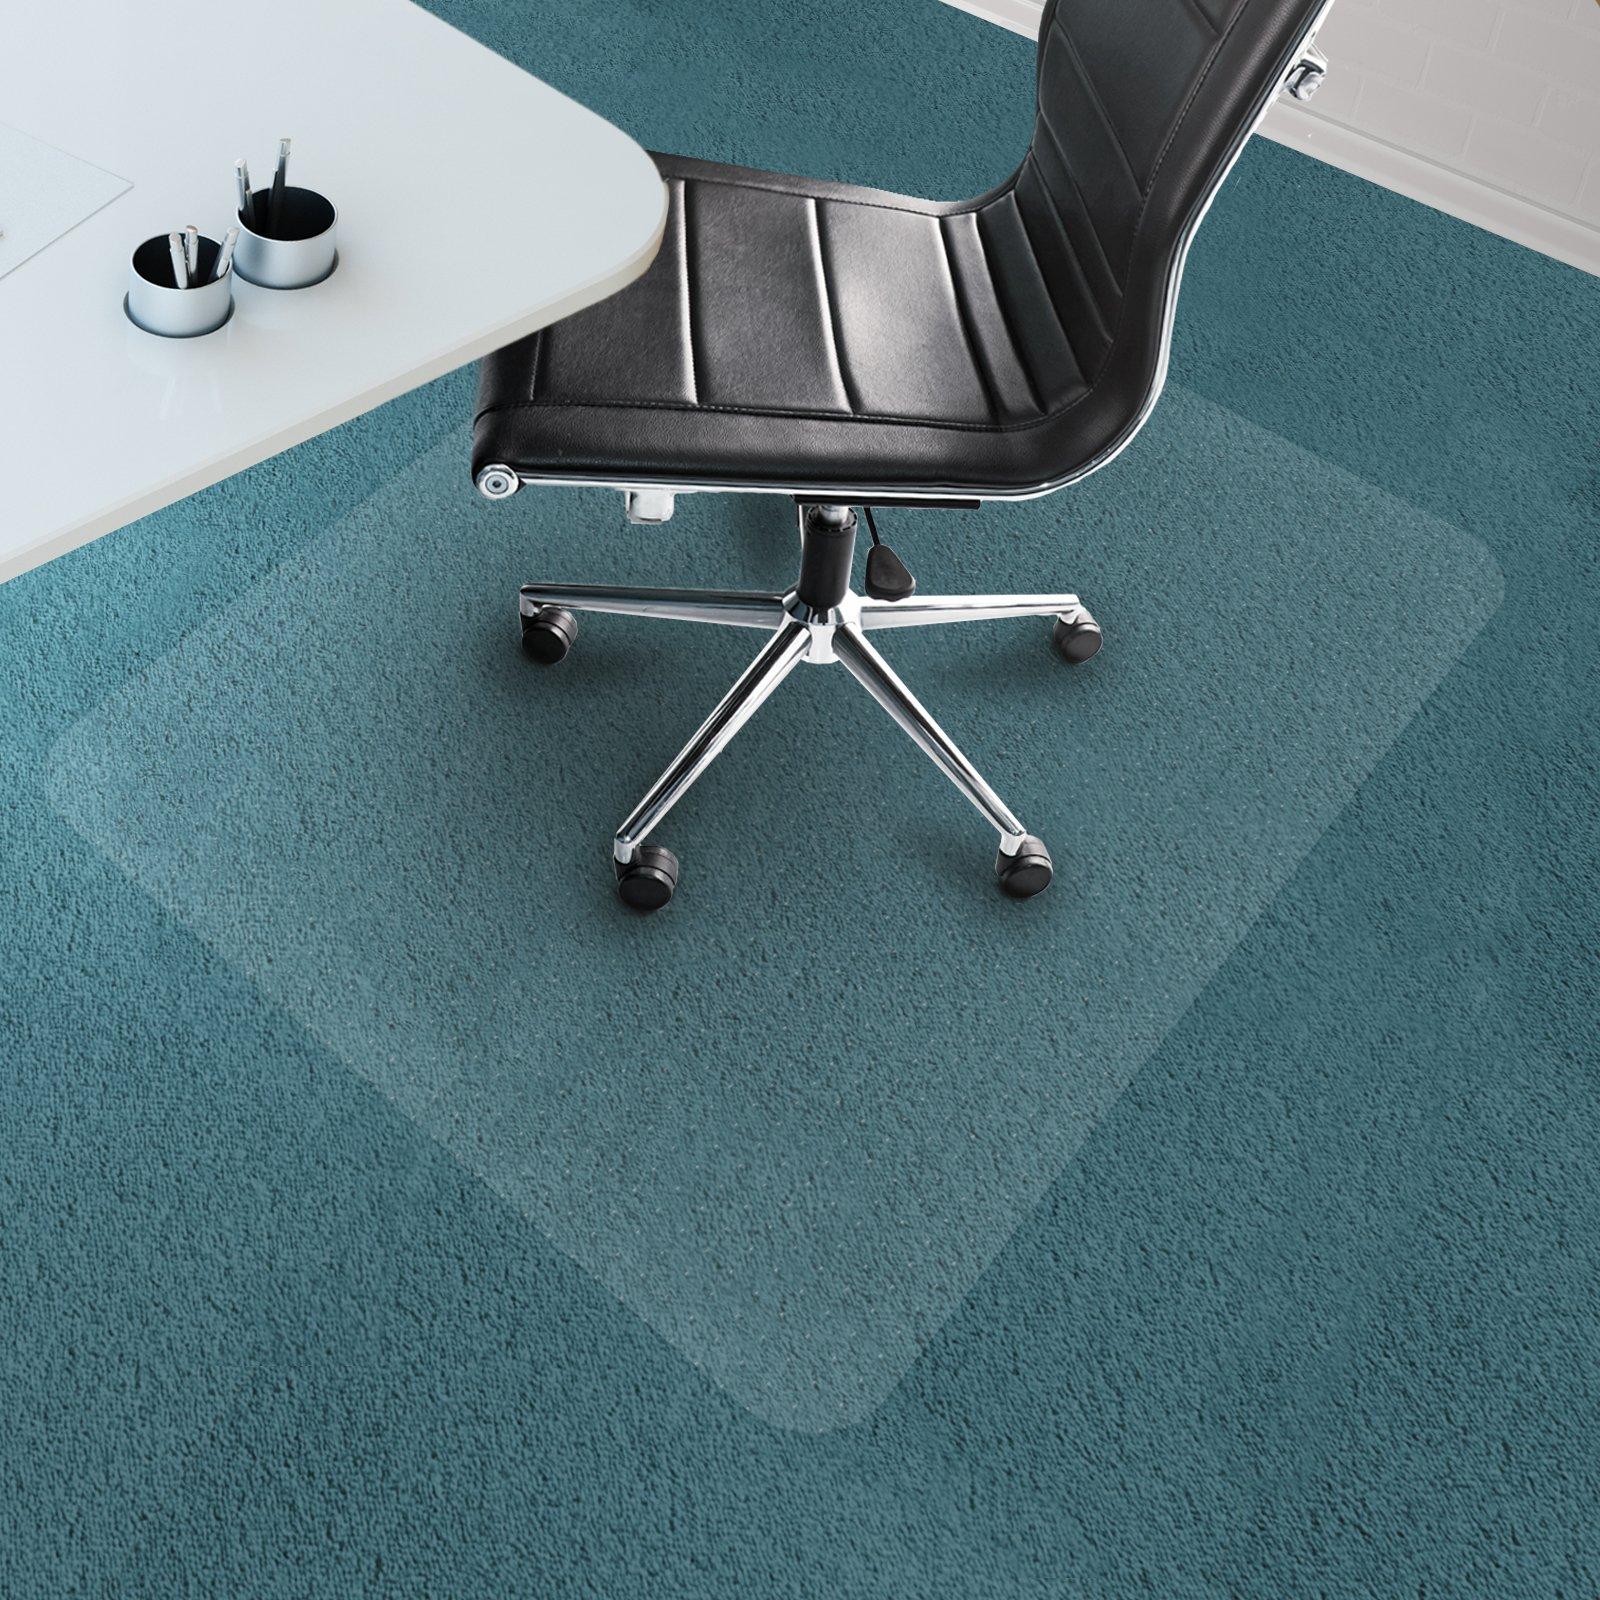 Office Marshal Chair Mat for Carpet Floors, PVC, Low/Medium Pile - 40'' x 48'', Multiple Sizes - Clear, Studded, Rectangular Carpet Floor Protection Mat